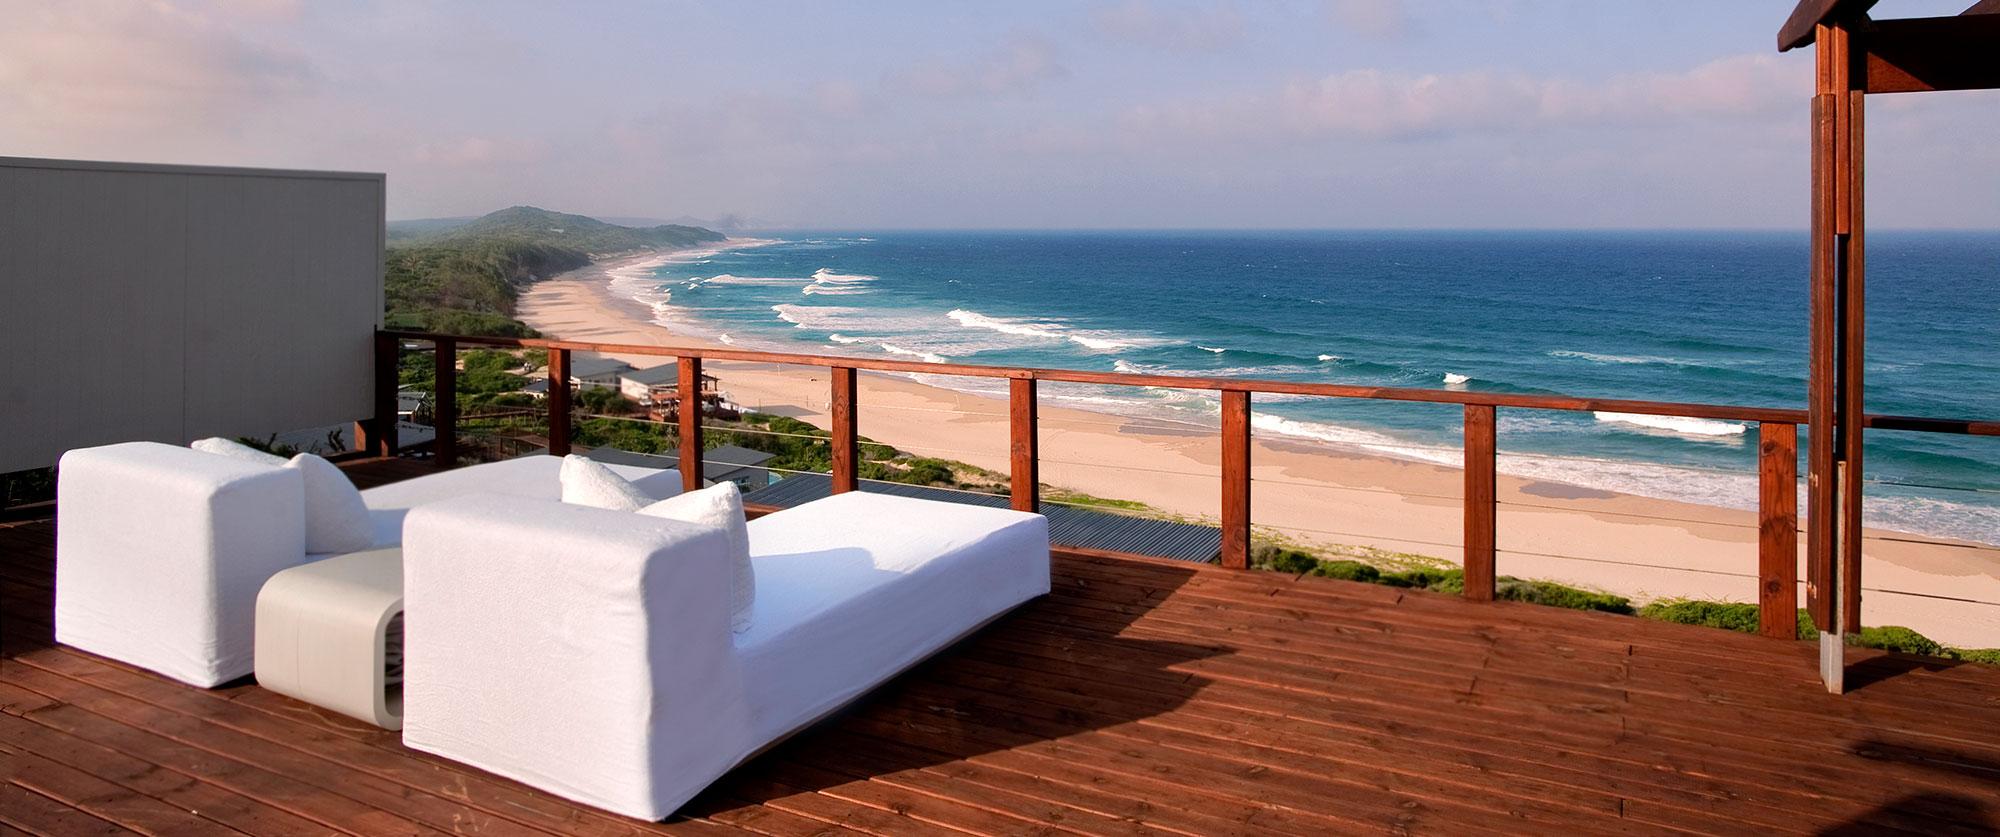 Beach Getaways - White Pearl Resorts Mozambique